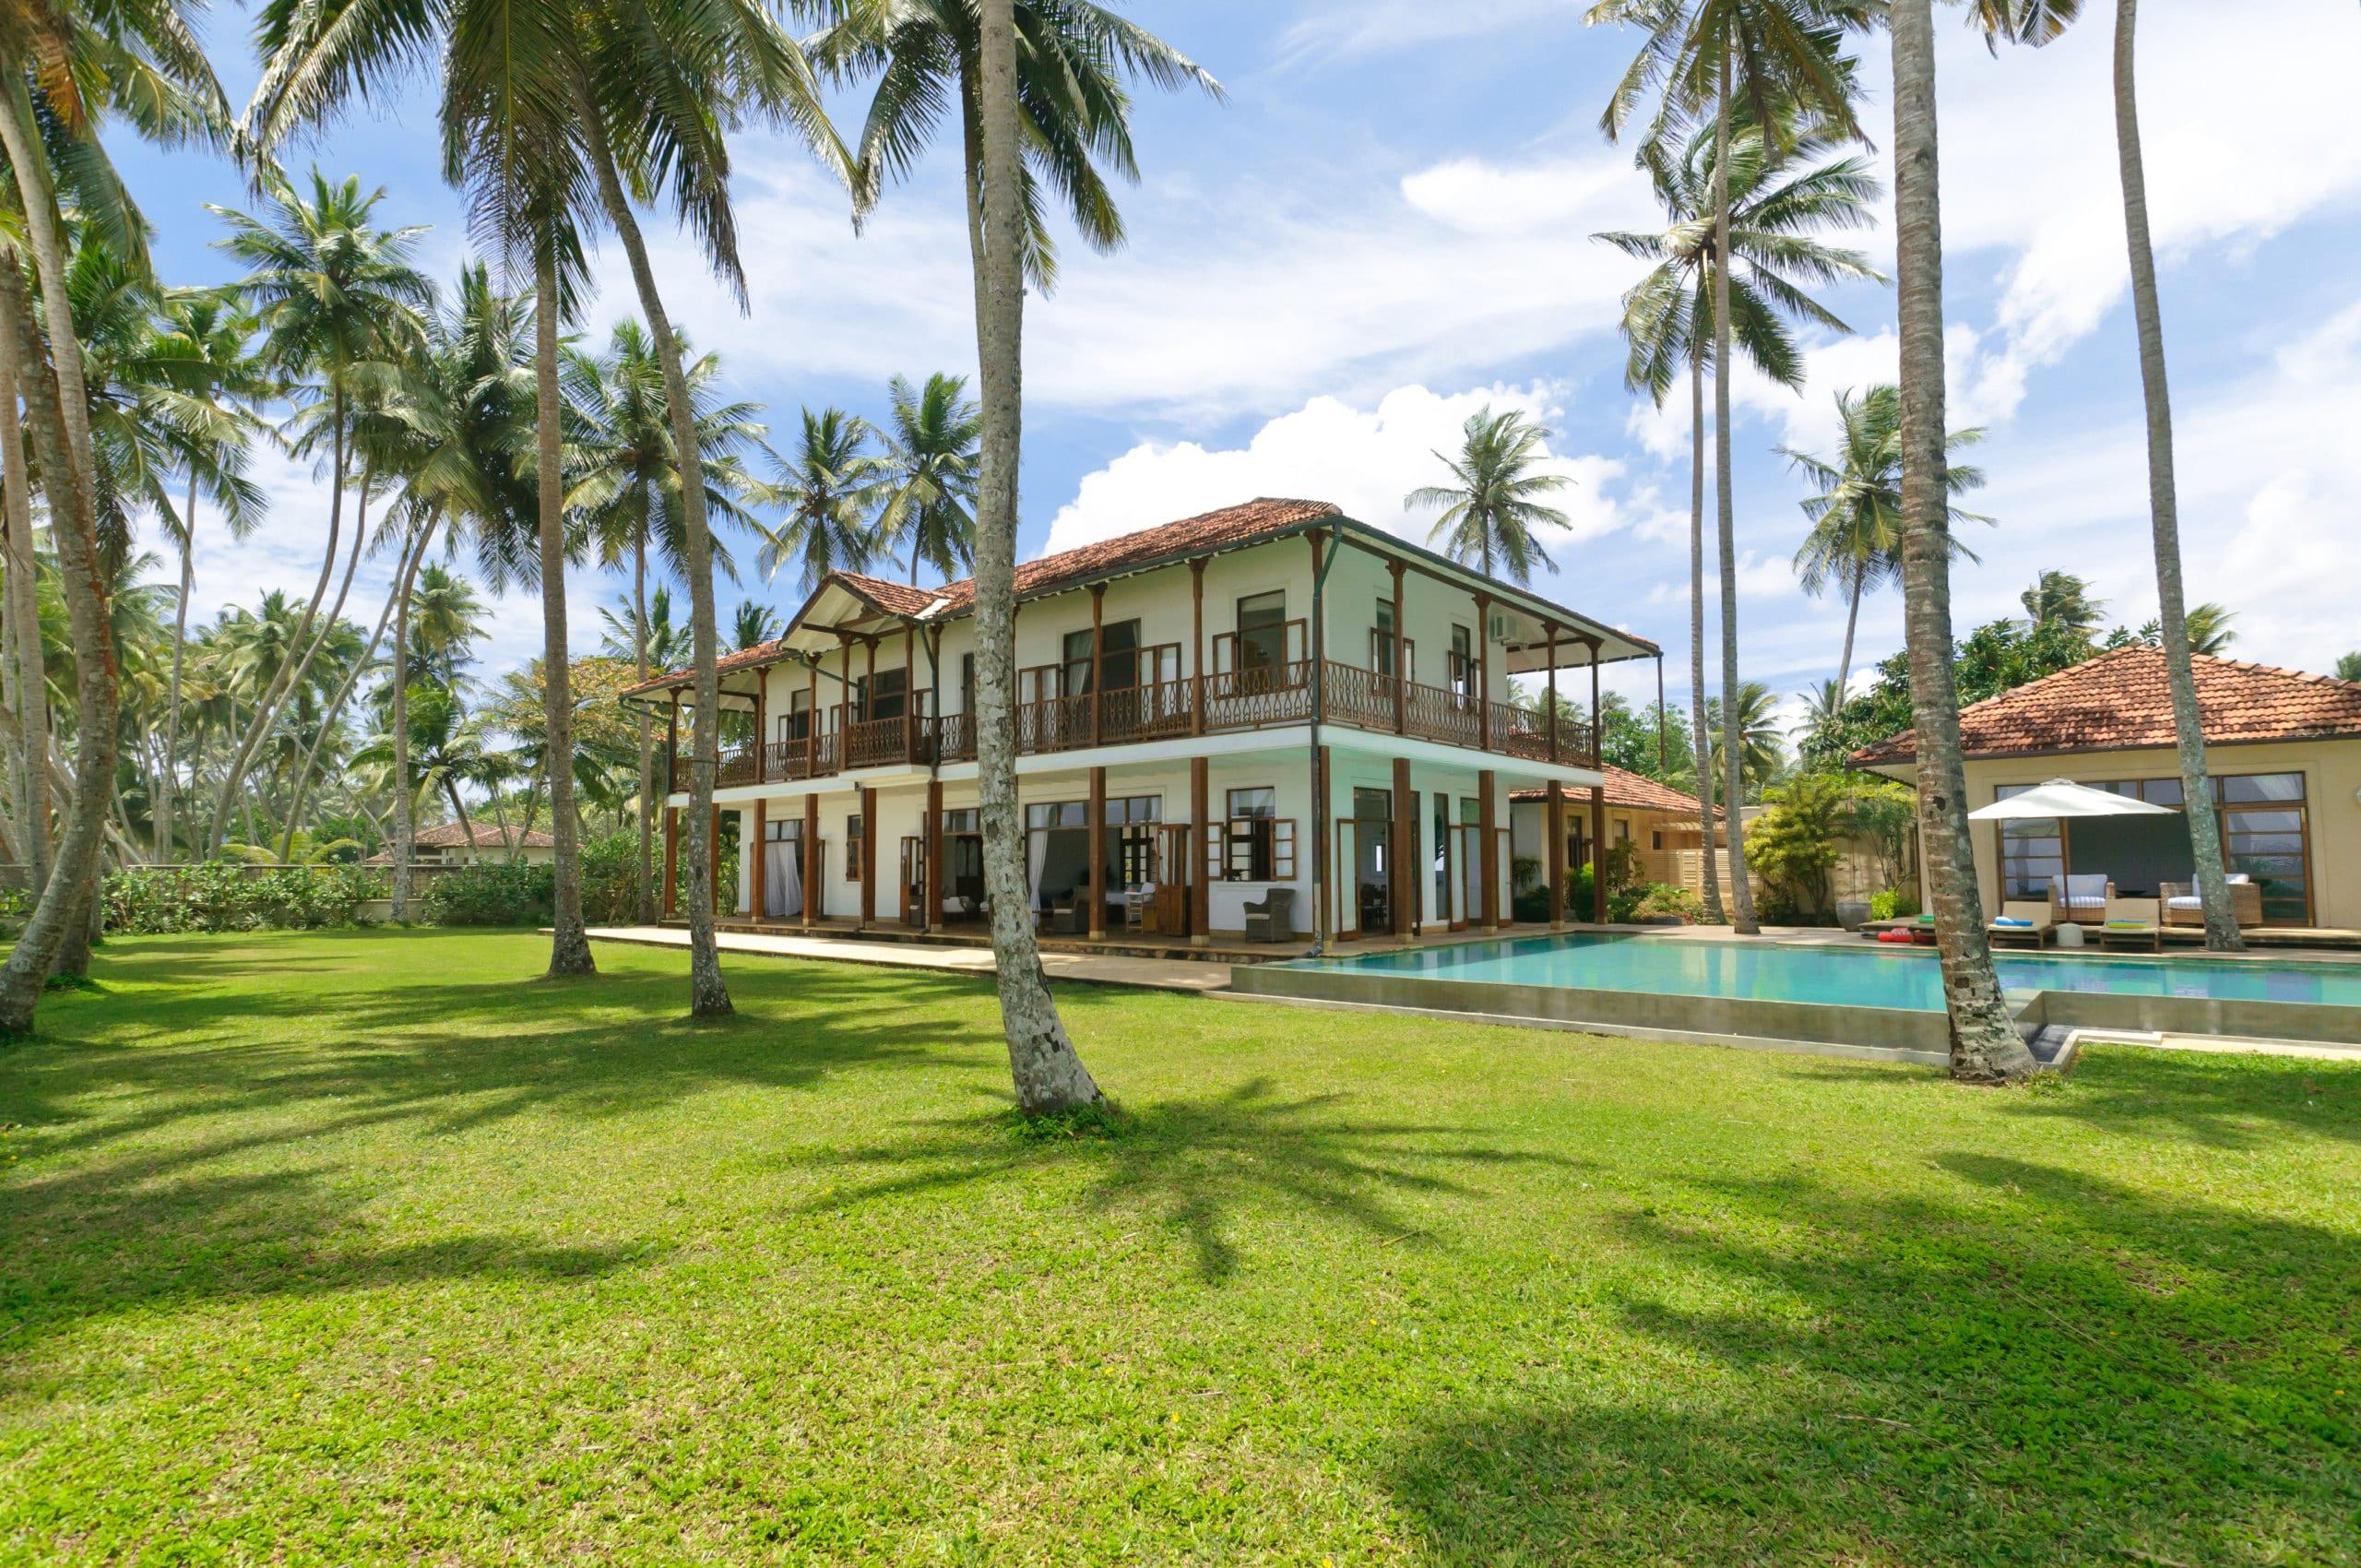 Best-Villas-Sri-Lanka-Sky-House-Garden1